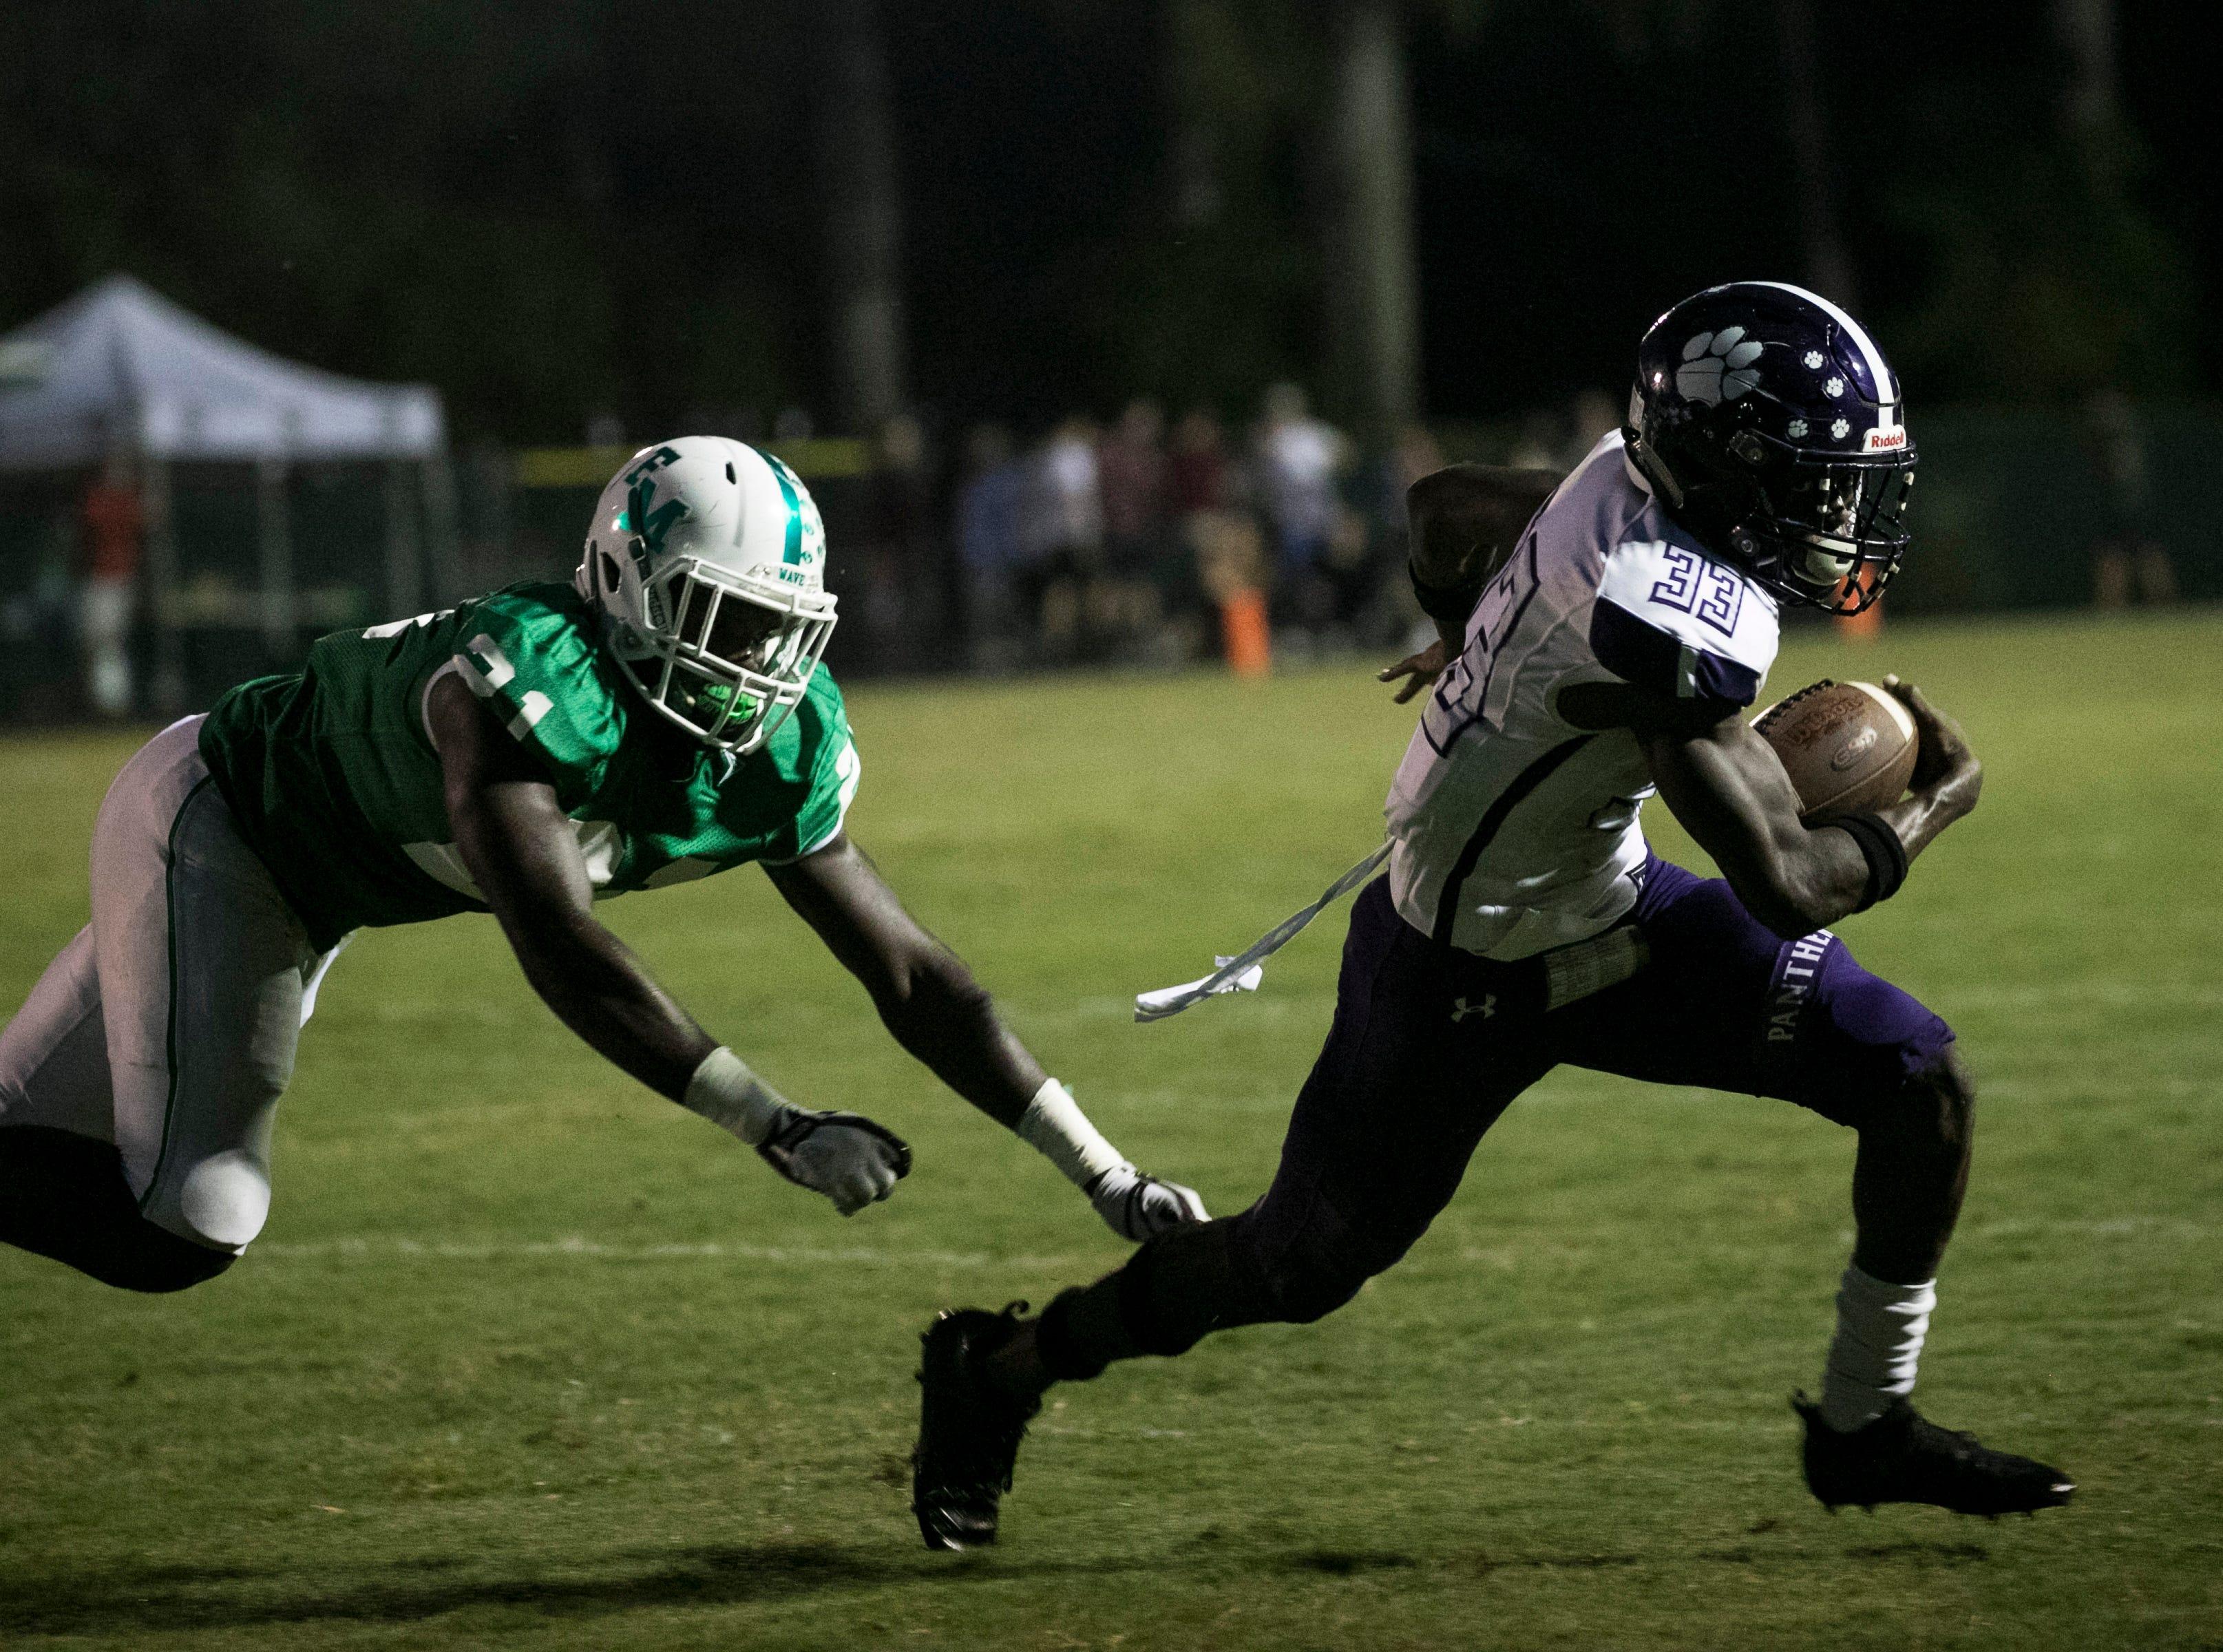 Chris Joseph of Cypress Lake runs the ball against Fort Myers Friday night, September 7, 2018, at Fort Myers High School.